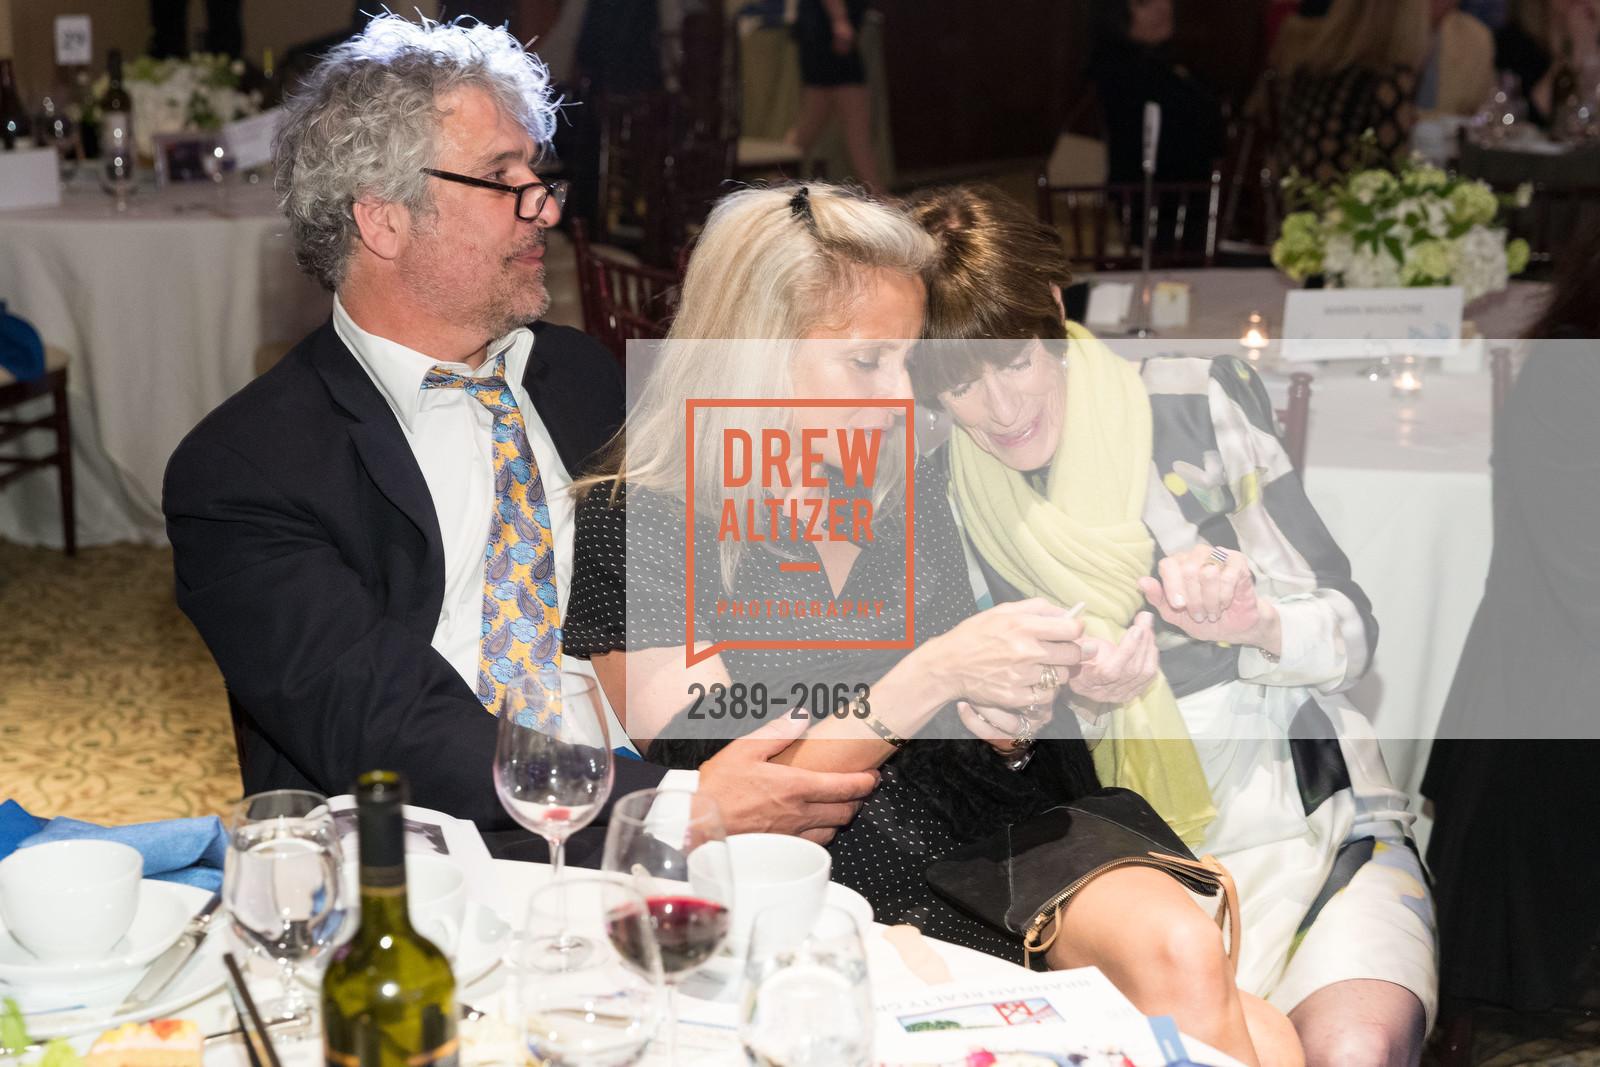 Gabriel Burczyk, Barbara Fabbri, Great Chefs and Wineries, Peacock Gap, April 22nd, 2017